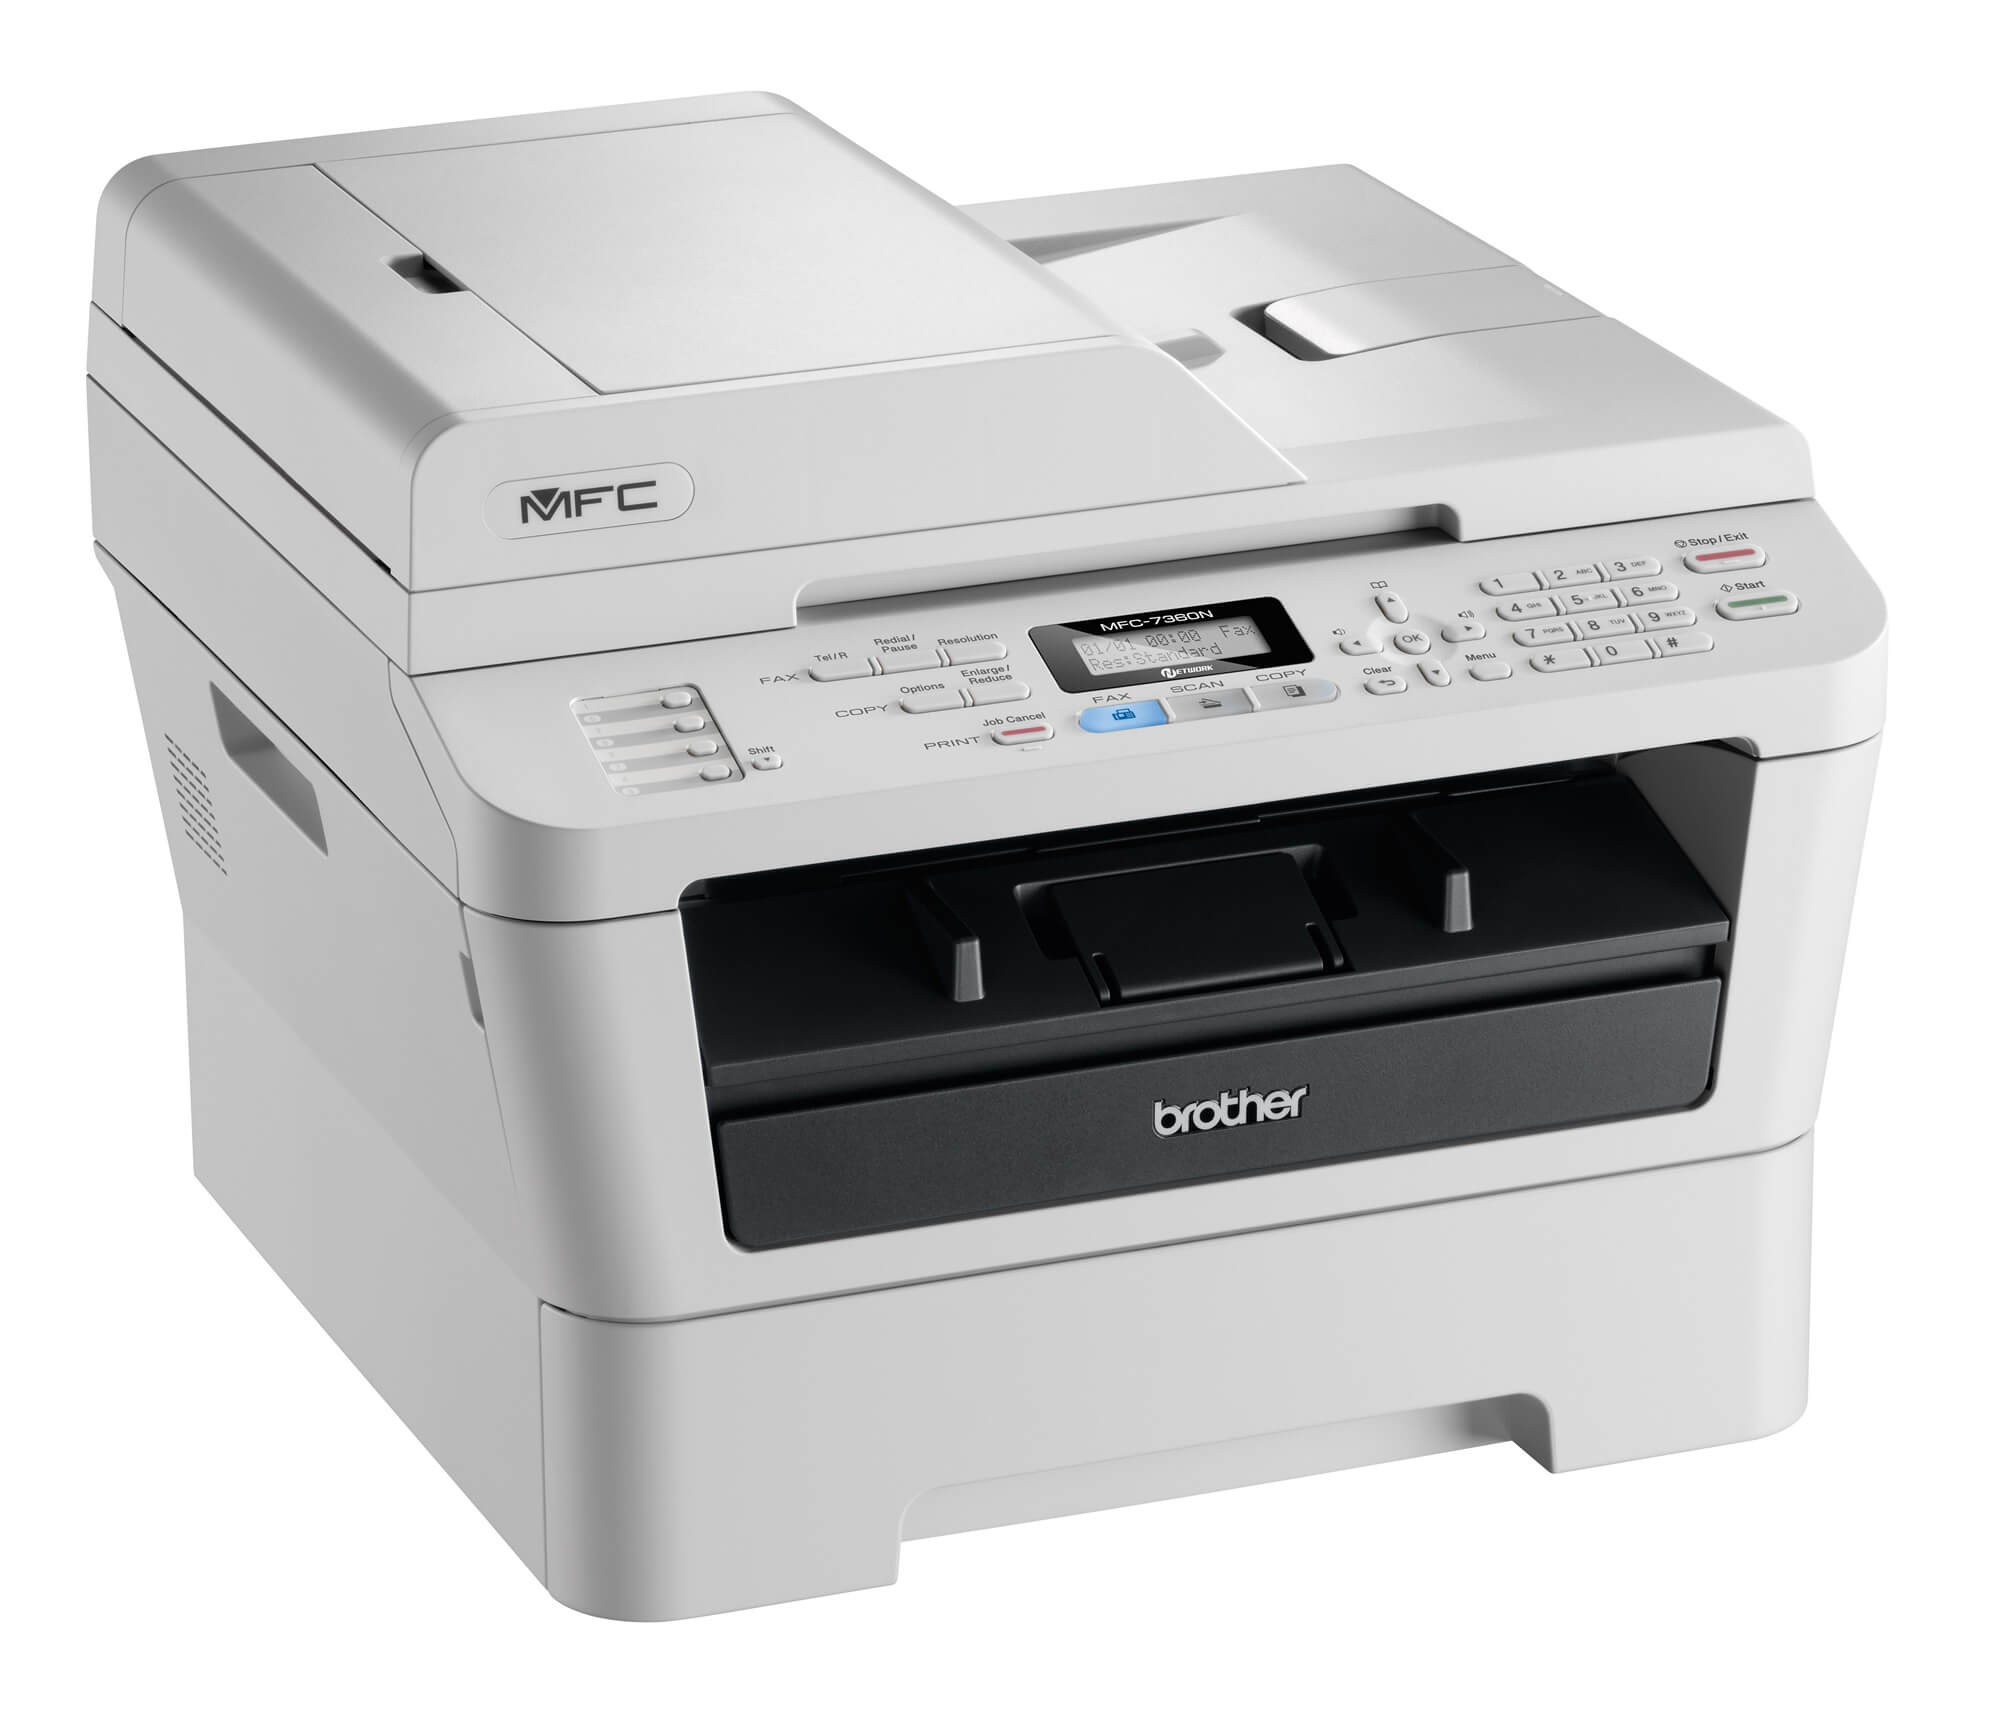 Принтер Brother MFC-7360N